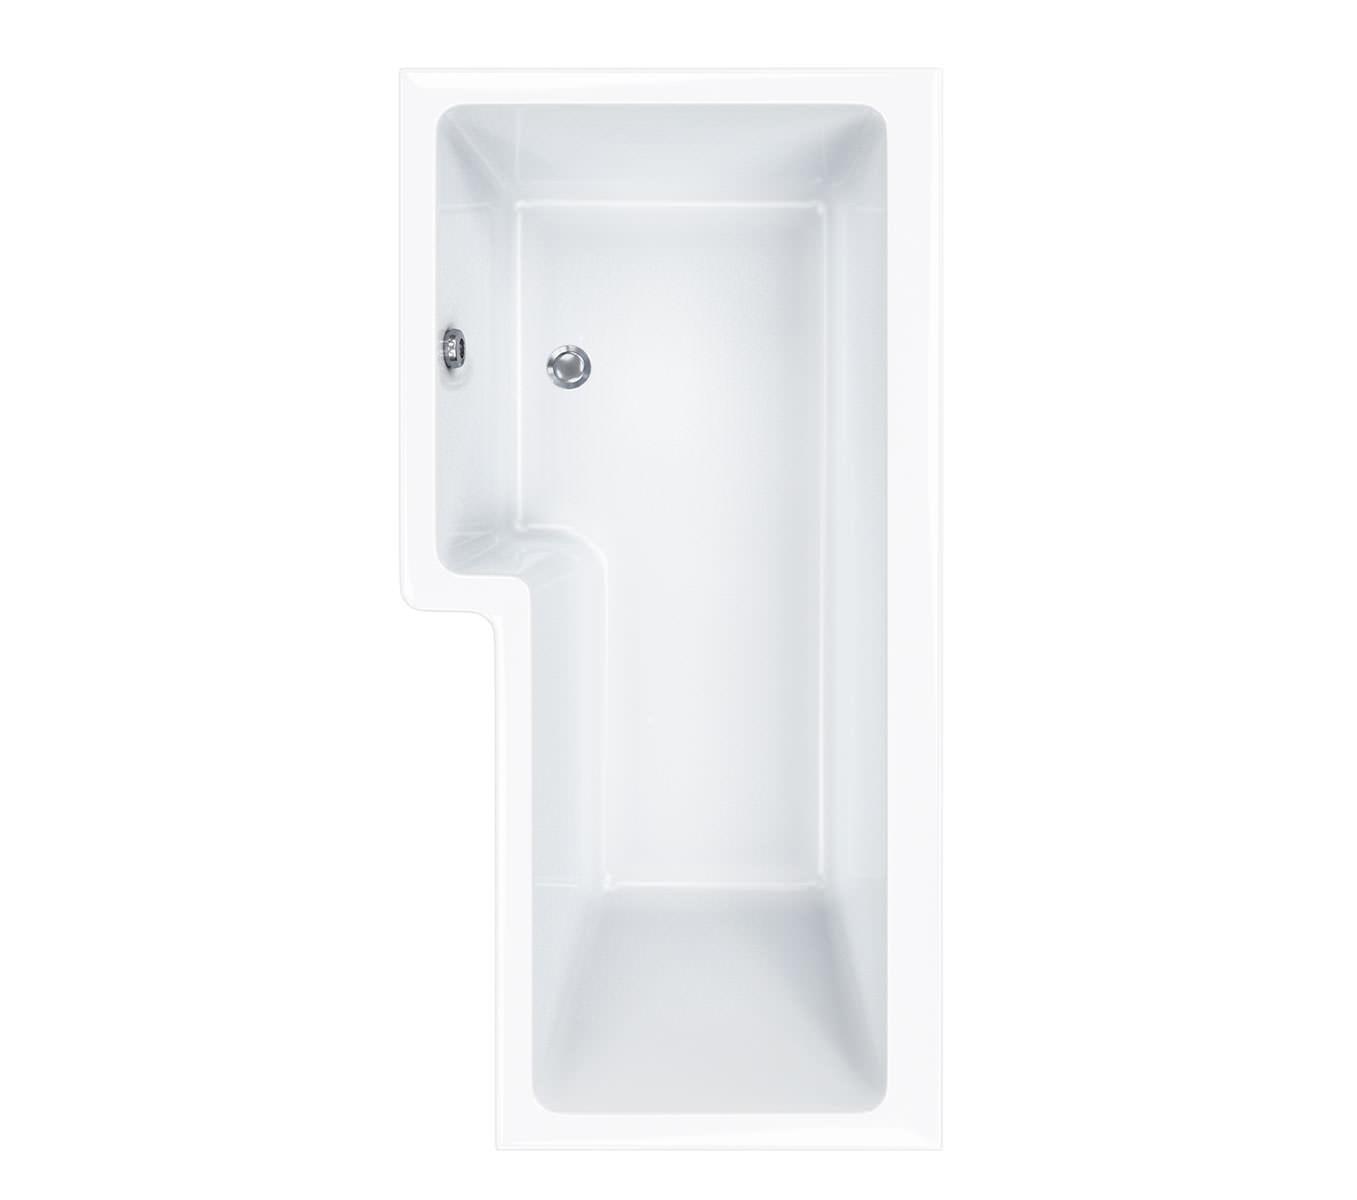 carron quantum square 5mm acrylic rh shower bath 1600 x